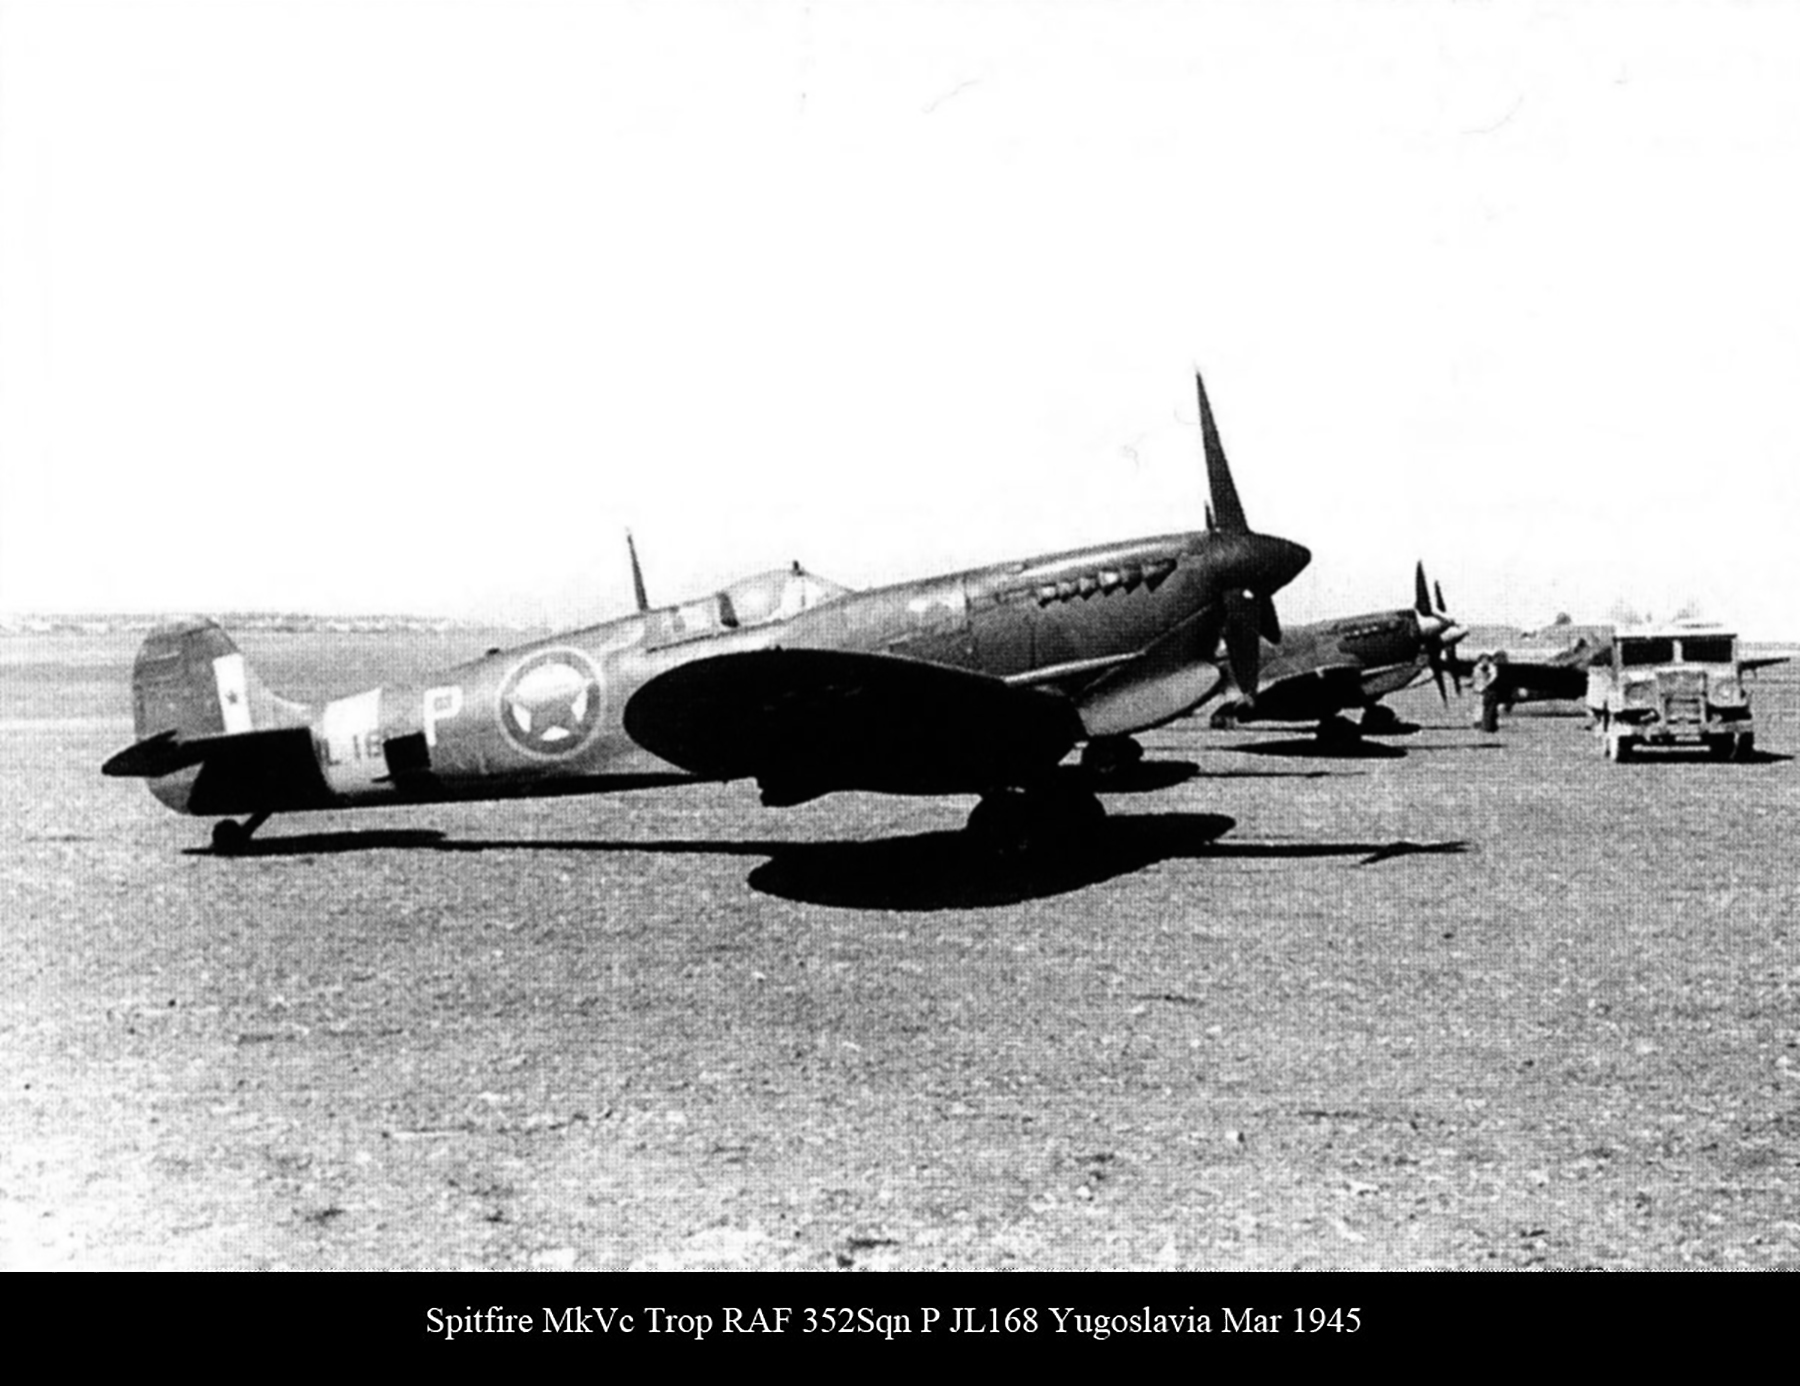 Spitfire MkVcTrop RAF 352Sqn P JL168 Yugoslavia Mar 1945 01